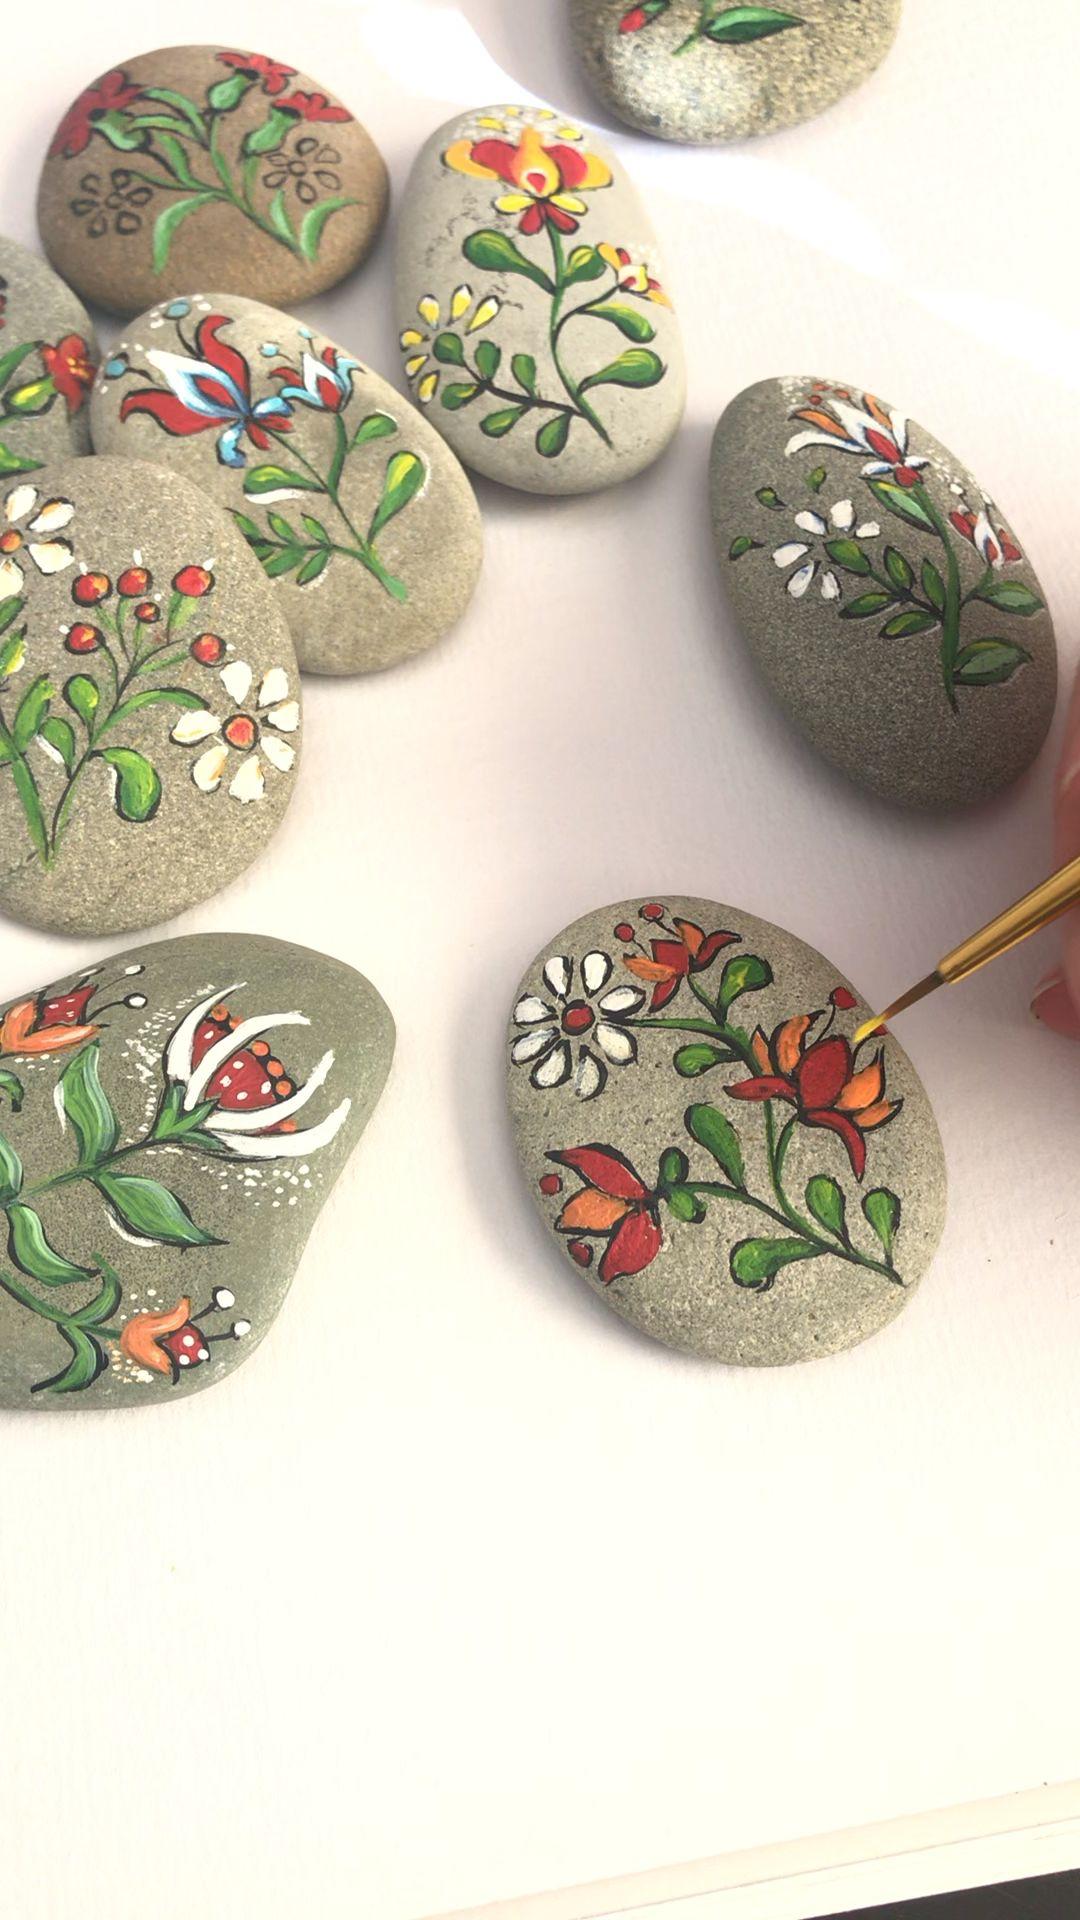 Photo of Folk art flowers painted pebbles by Christine Onward